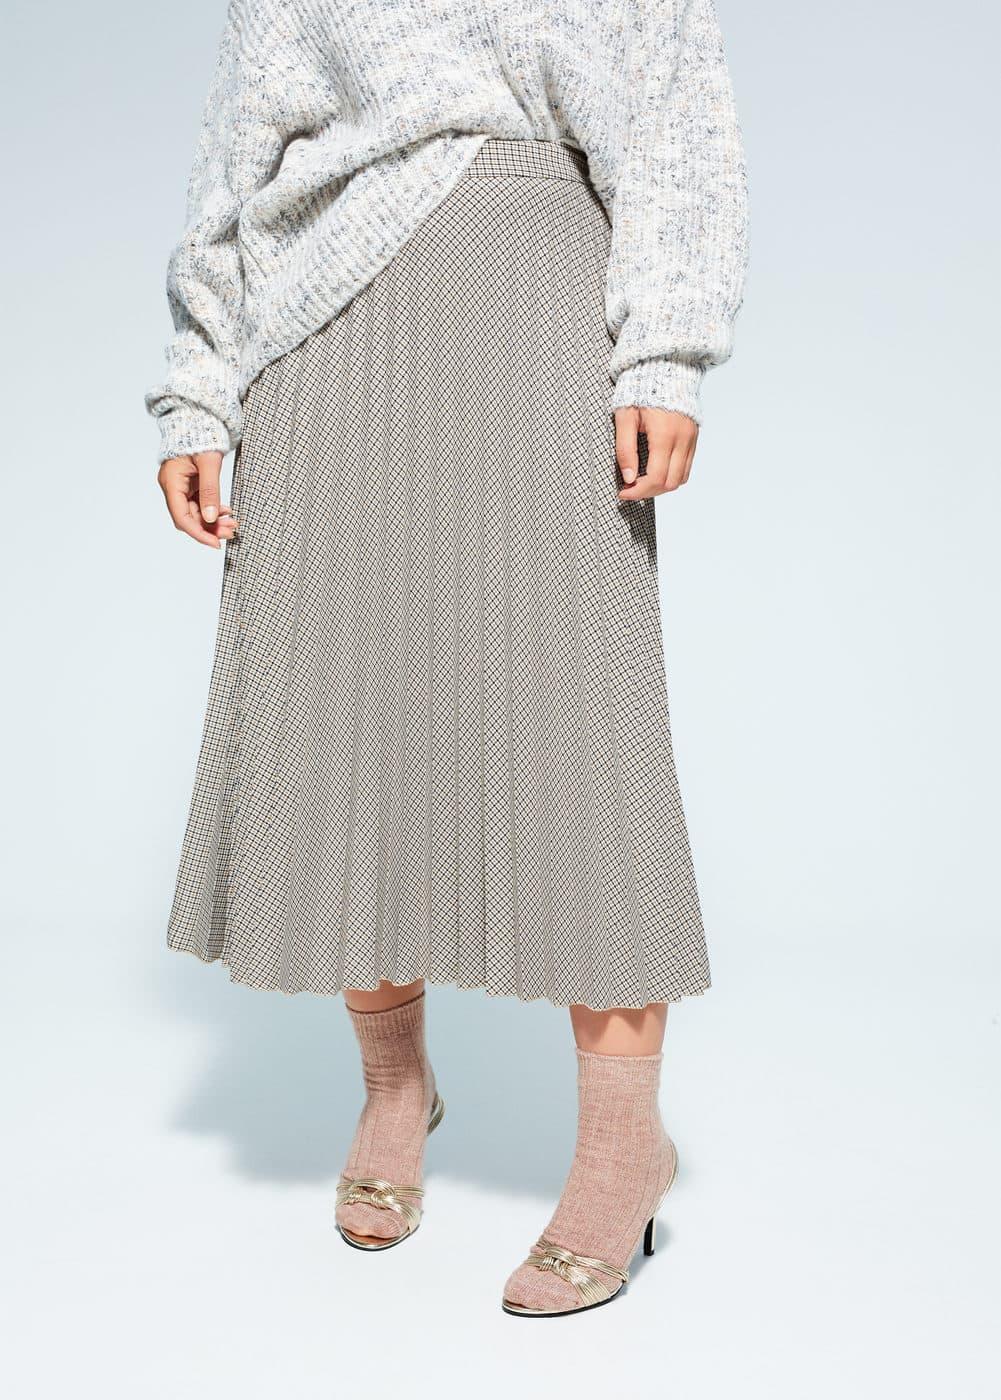 v-monsieur:falda plisada estampada